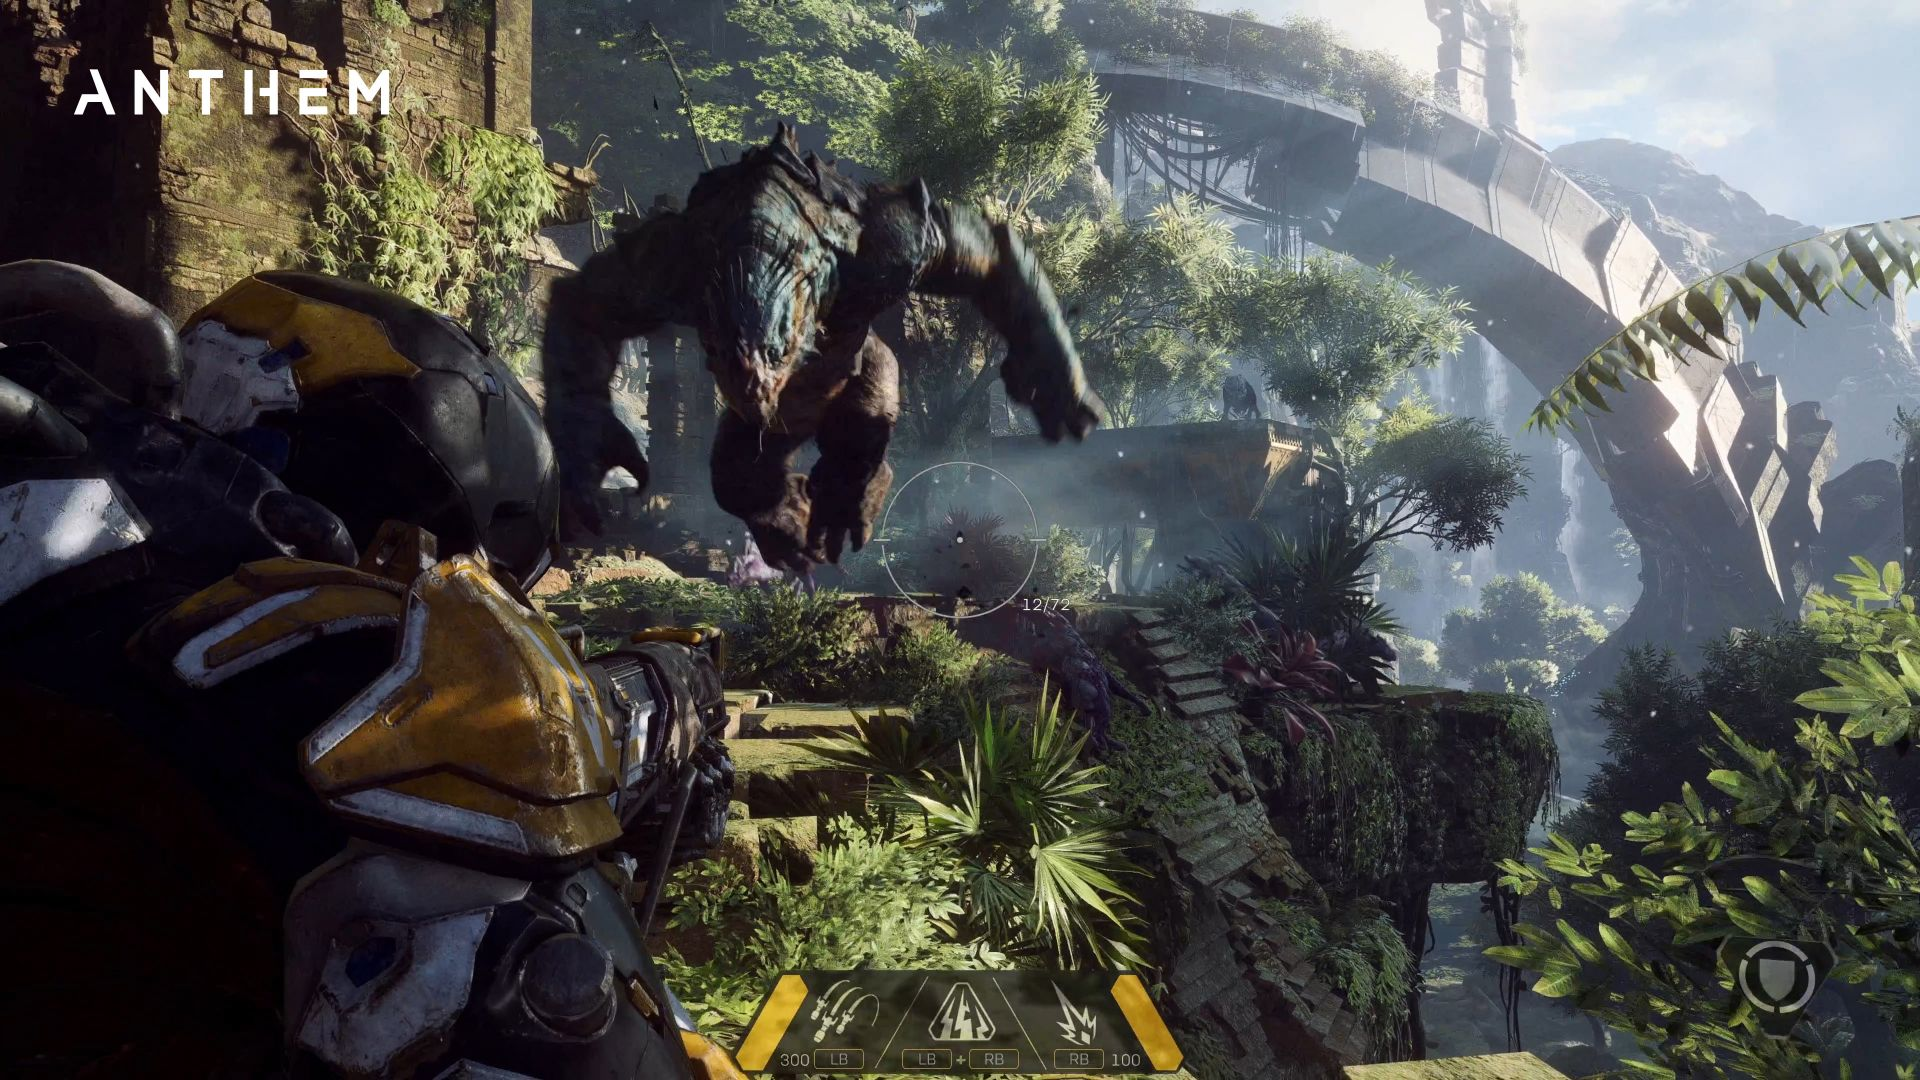 Wallpaper Anthem 4k Screenshot Gameplay E3 2017 Games